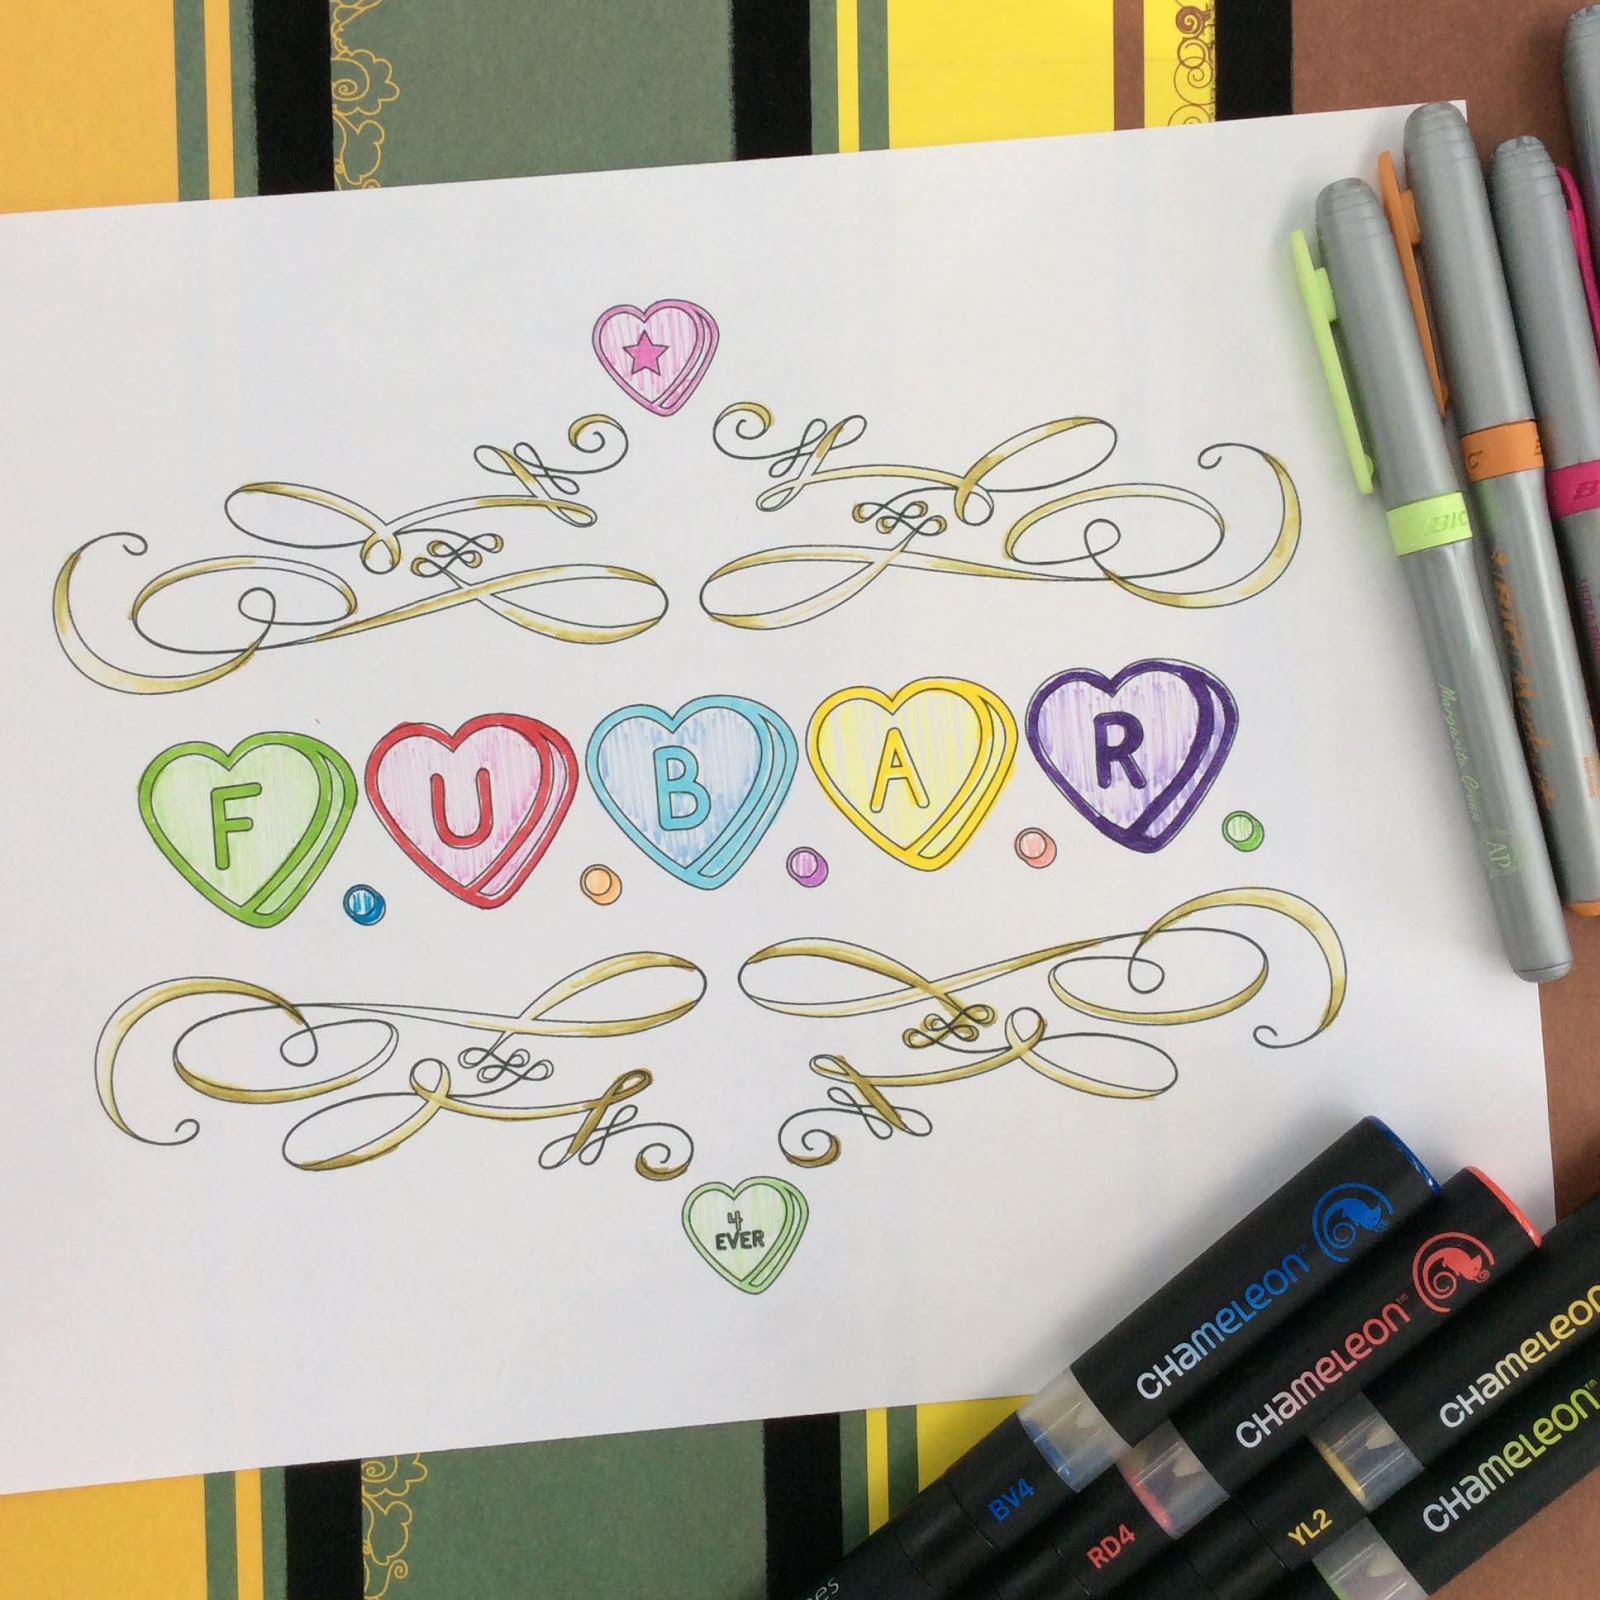 FUBAR Conversation Heart Adult Coloring Page Stefanie Girard